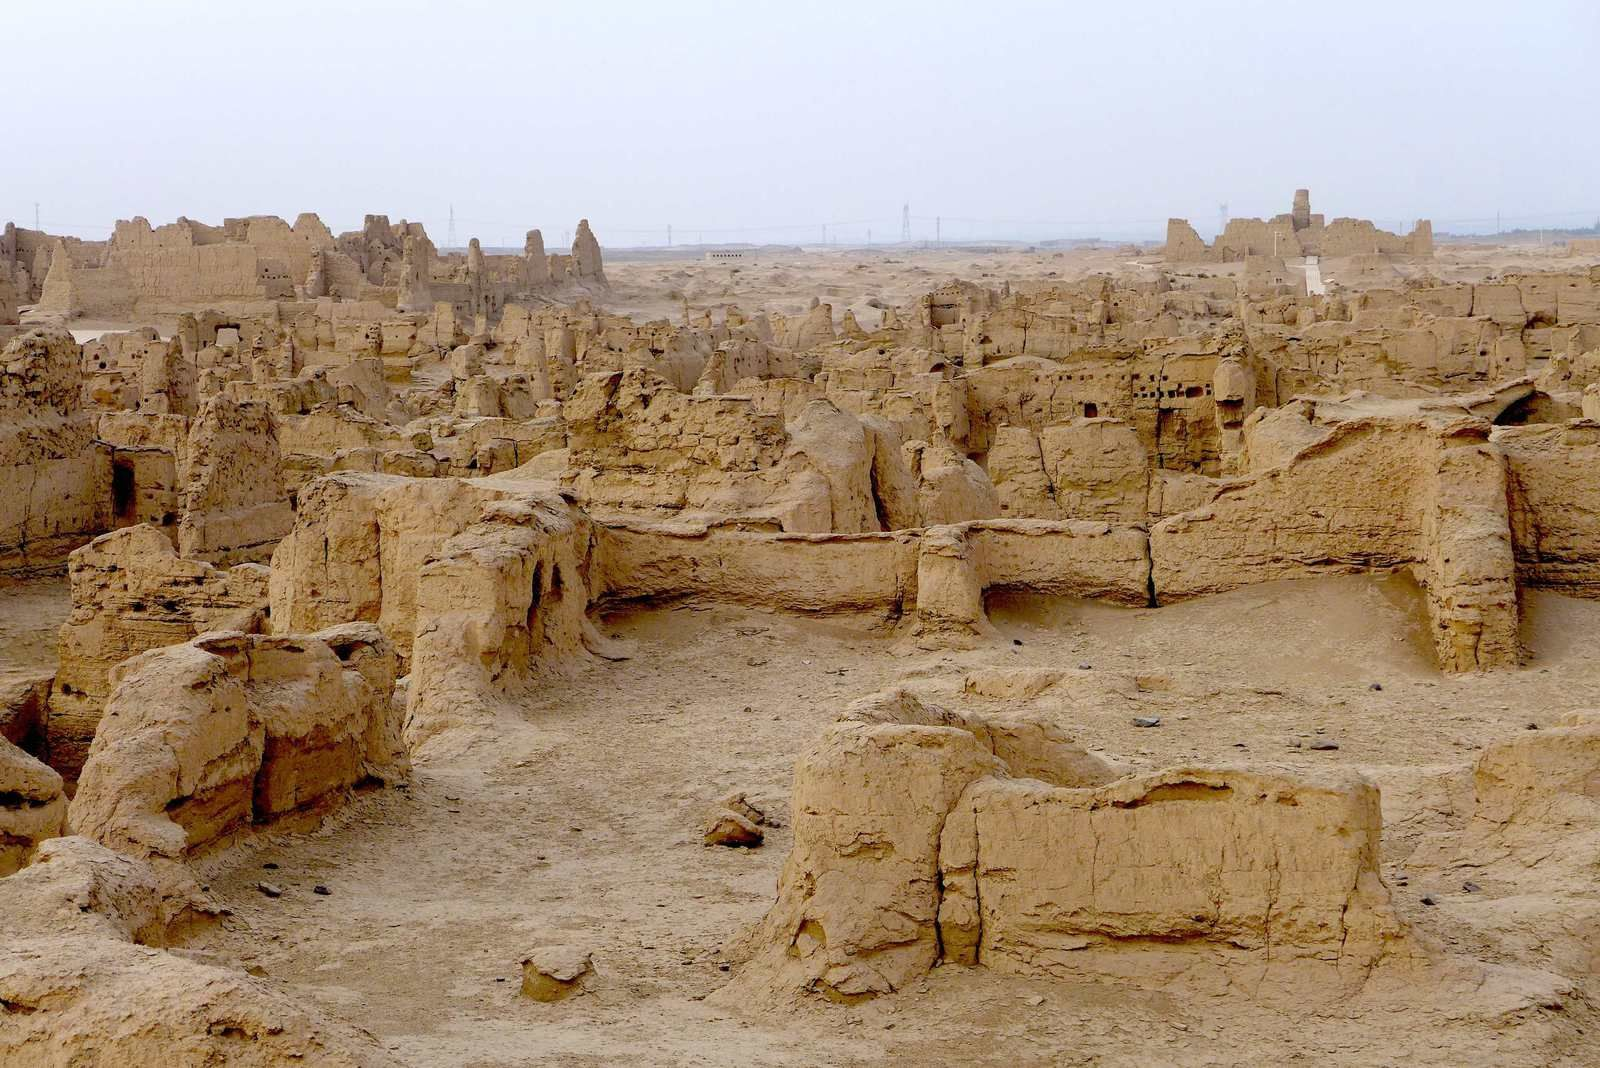 Les ruines de Jiaohe